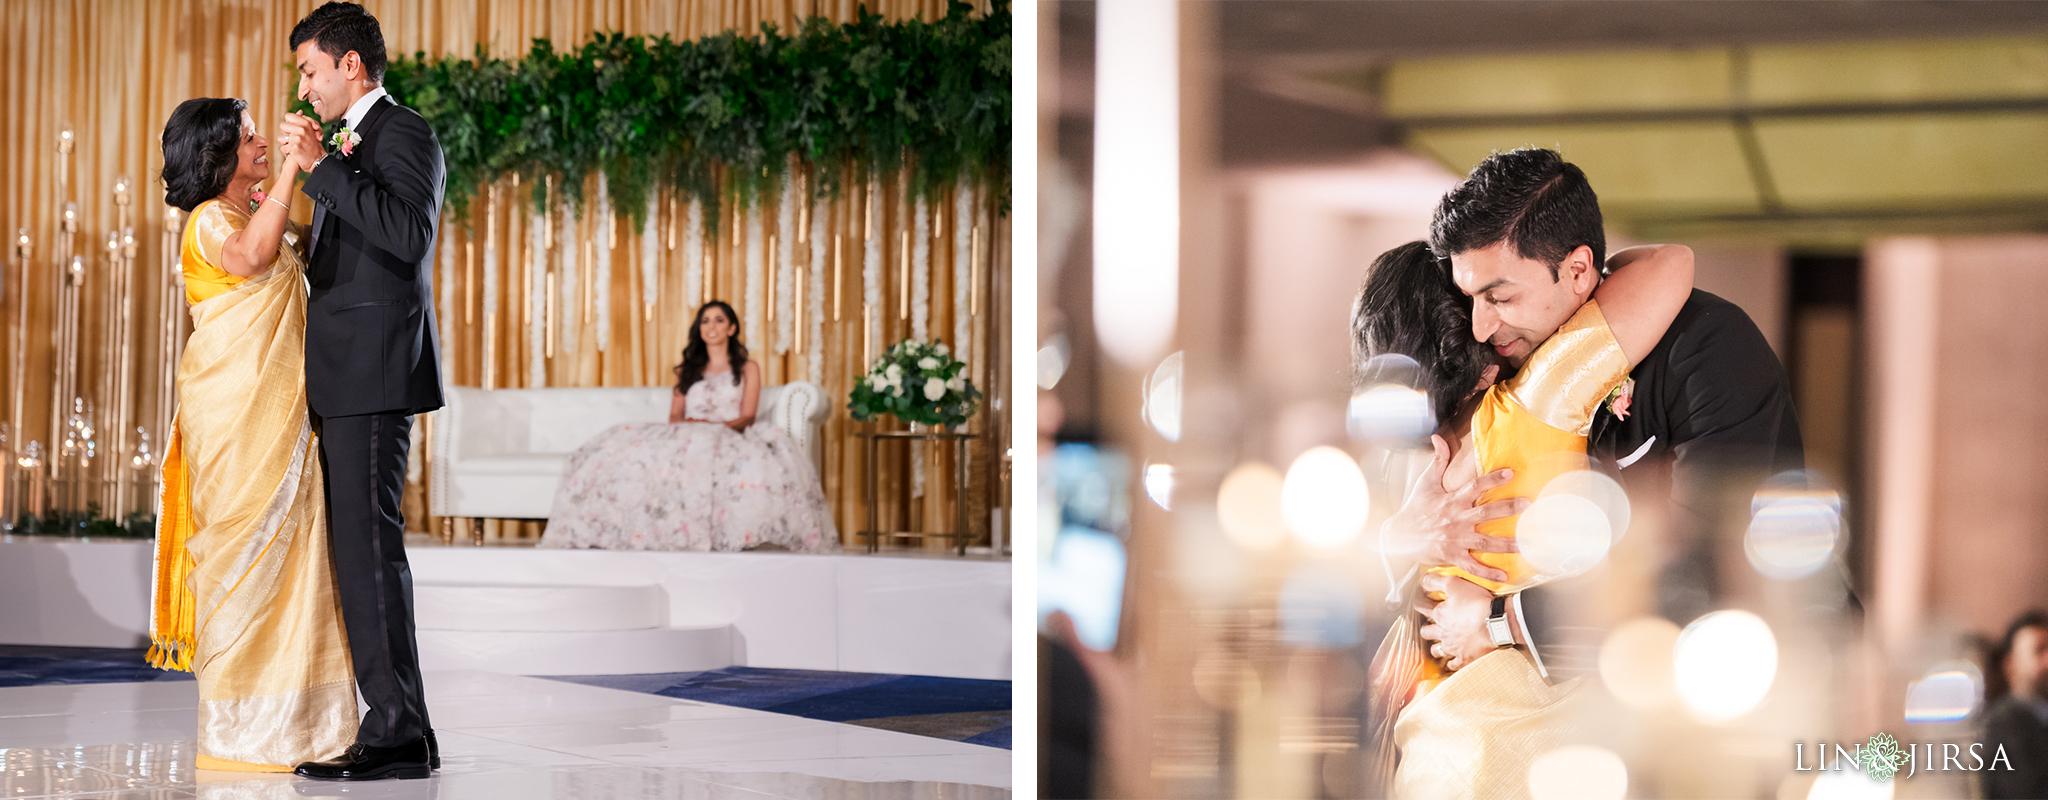 28 Newport Beach Marriott Indian Wedding Photography